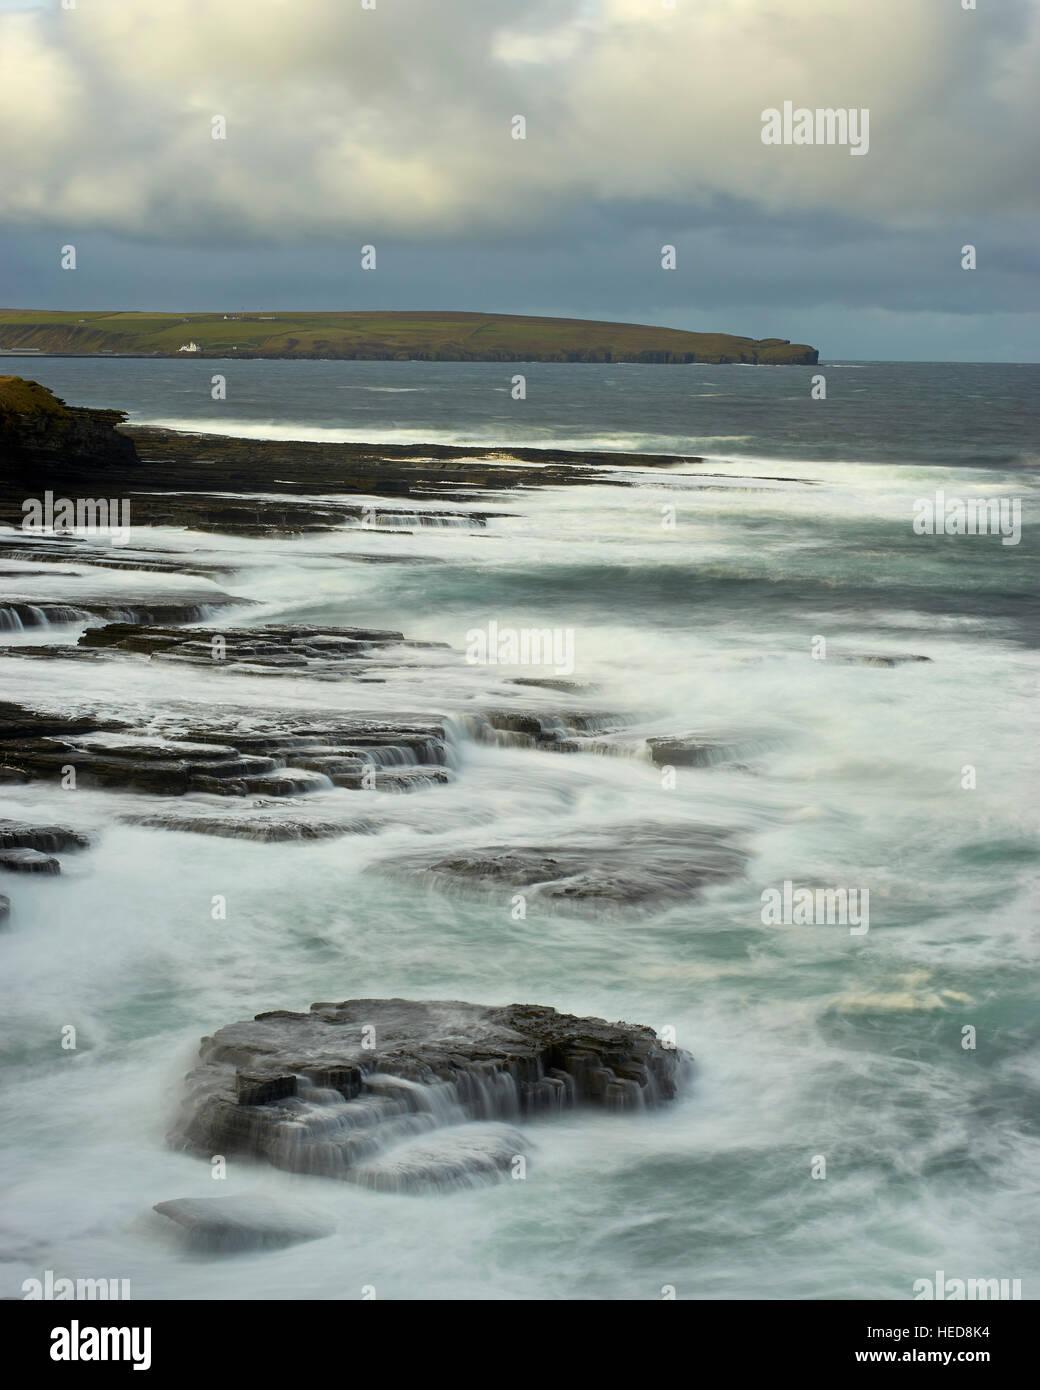 Coastline west of Thurso, looking to Holborn Head, Caithness, Scotland. - Stock Image